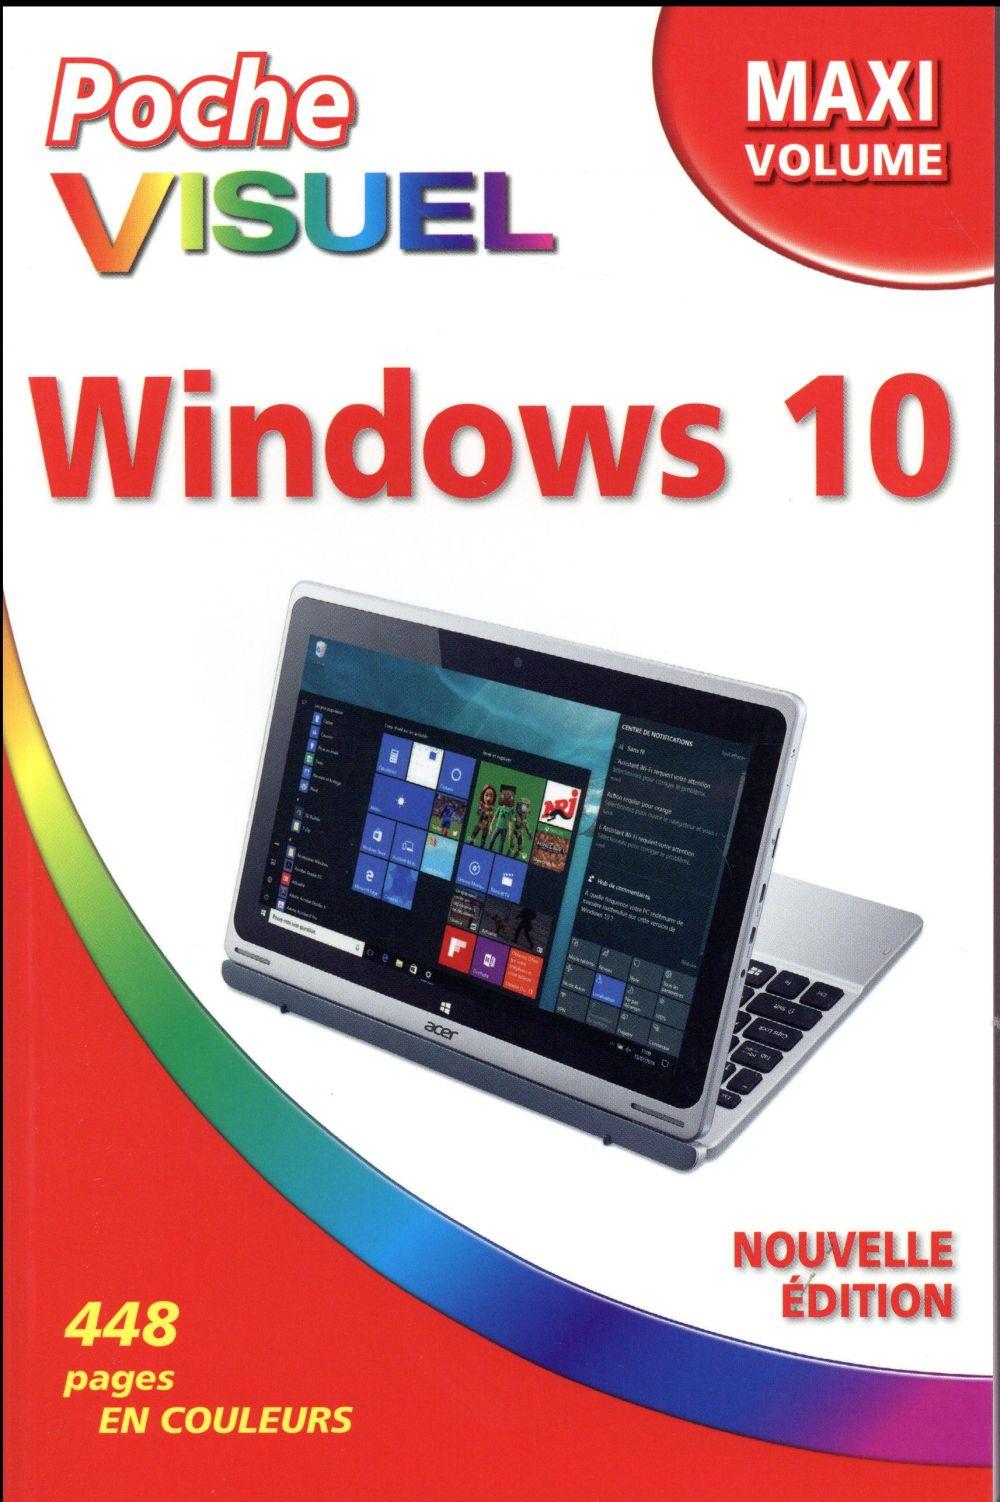 McFedries Paul - POCHE VISUEL WINDOWS 10 MAXI VOLUME